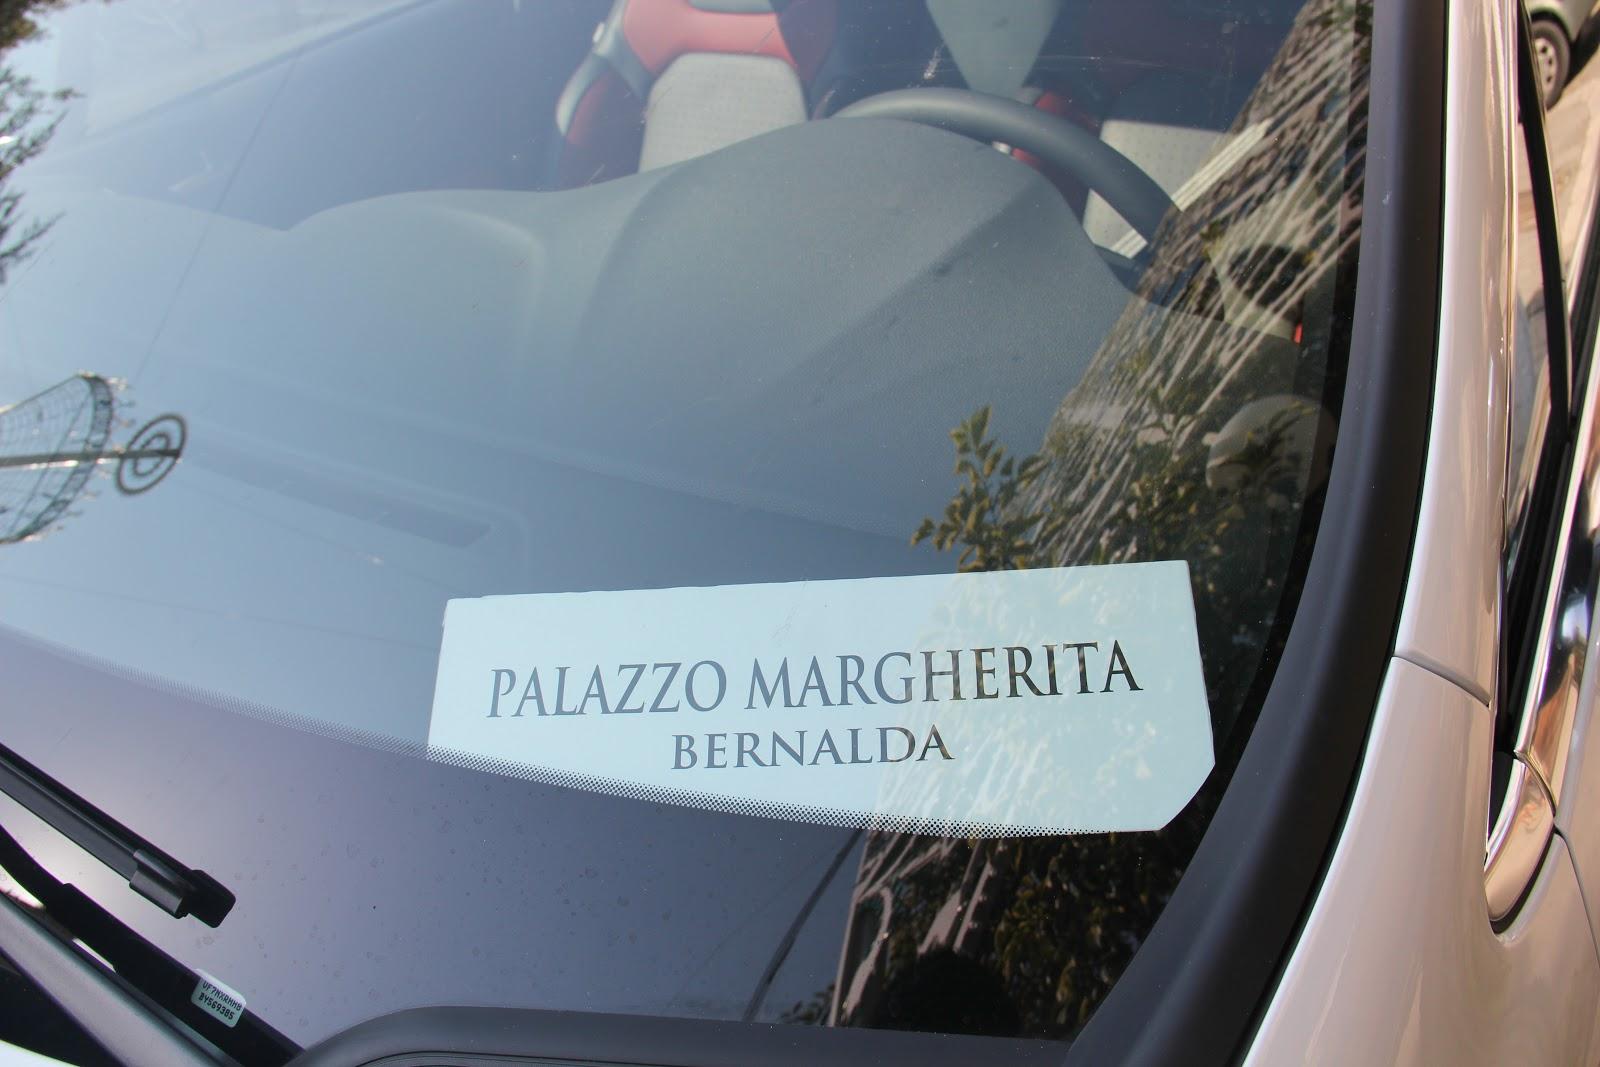 http://2.bp.blogspot.com/-RWbAVCWTZvY/TmpnijHInJI/AAAAAAAAJtw/915knPdRzog/s1600/9+Le+auto+di+casa+Margherita+Bernalda+27-08-11.JPG